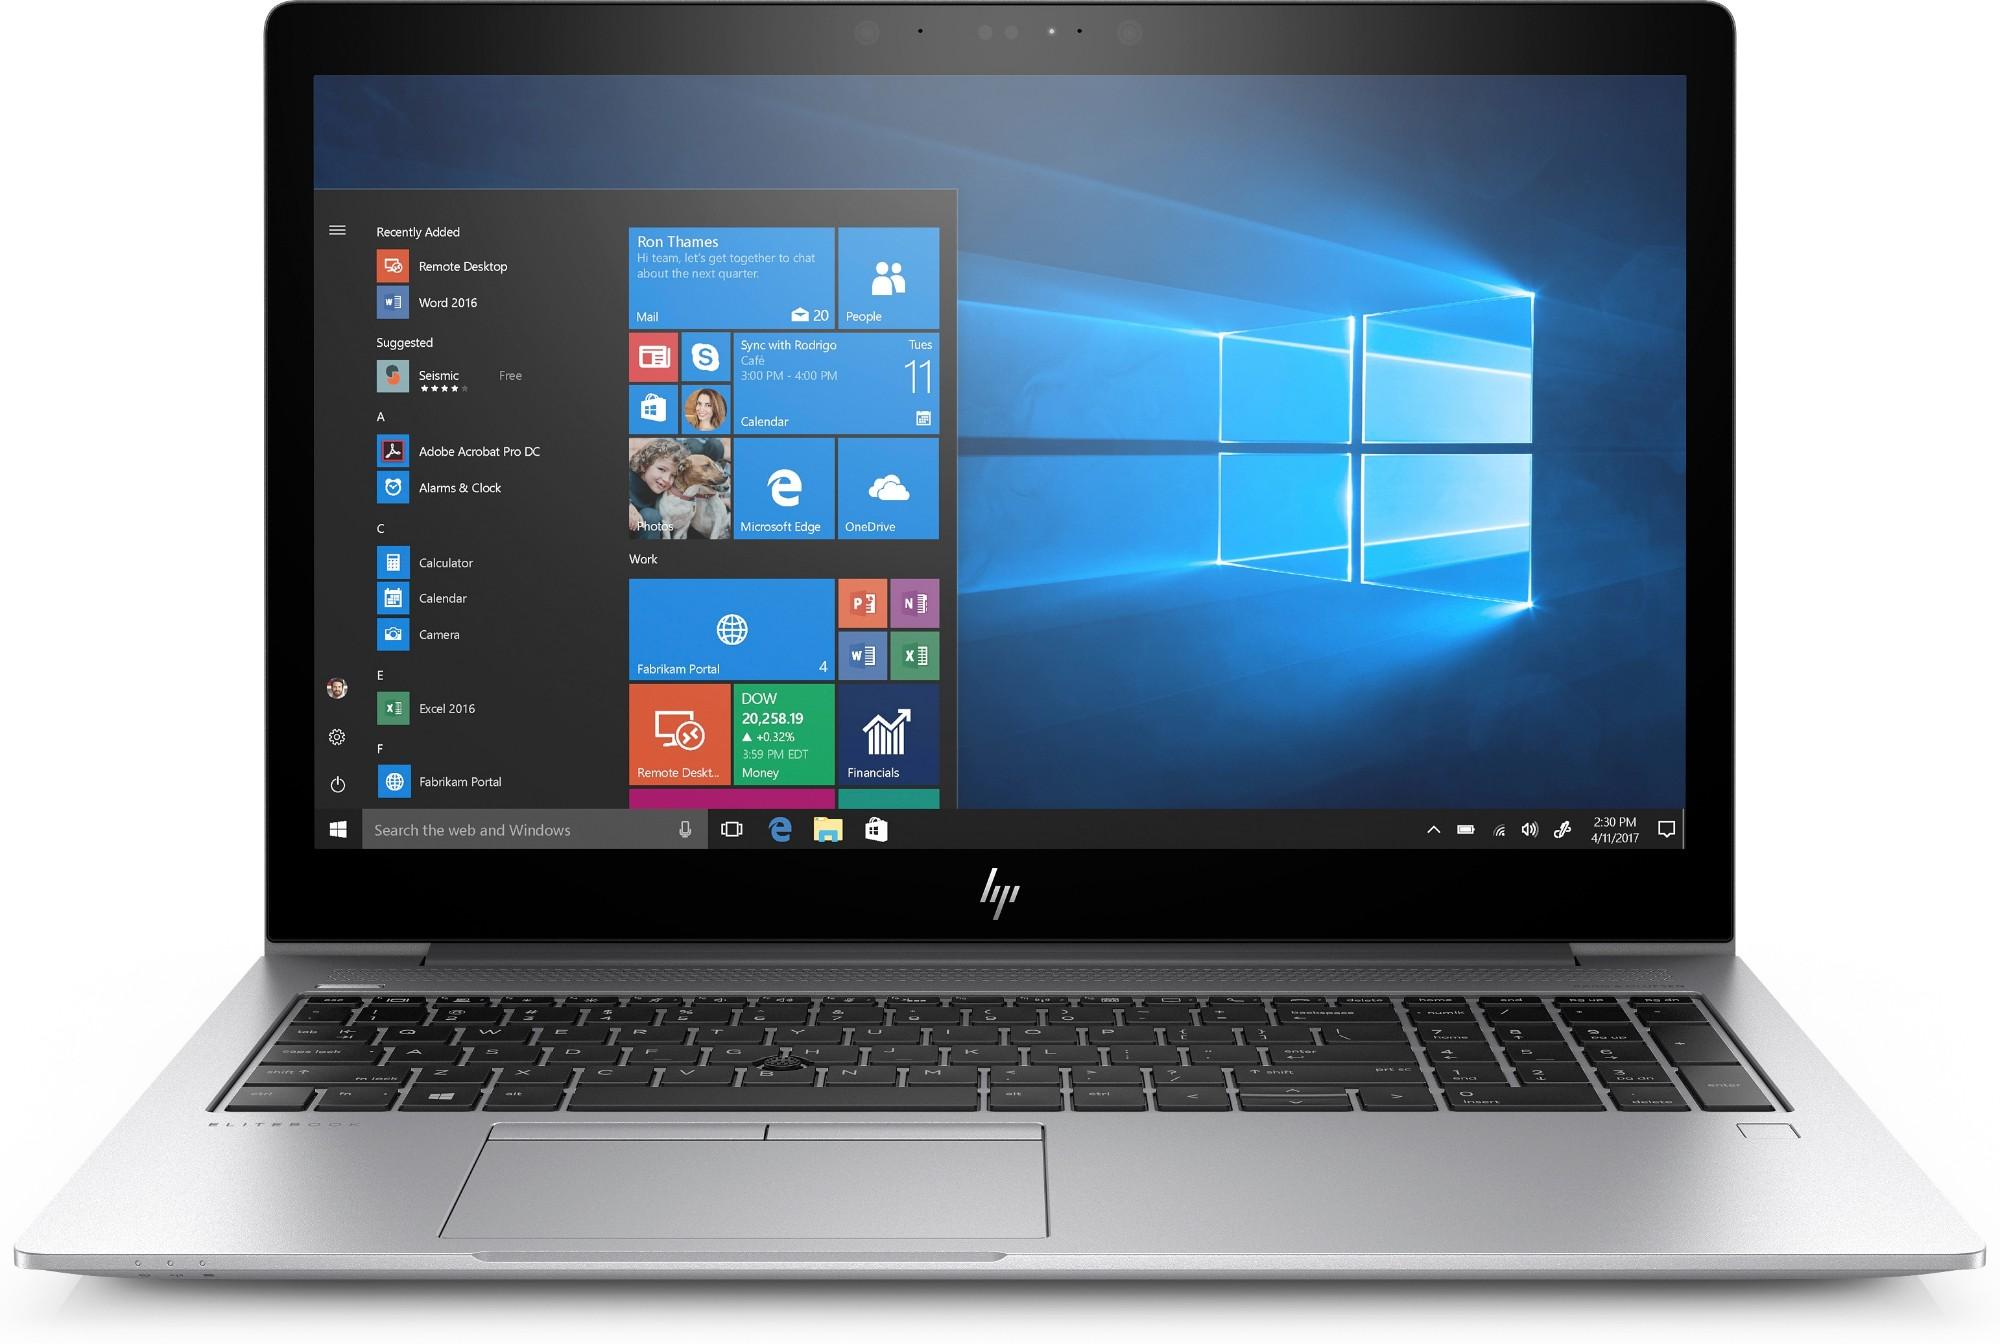 "HP EliteBook 755 G5 Portátil Plata 39,6 cm (15.6"") 1920 x 1080 Pixeles AMD Ryzen 7 8 GB DDR4-SDRAM 512 GB SSD Wi-Fi 5 (802.11ac) Windows 10 Pro"